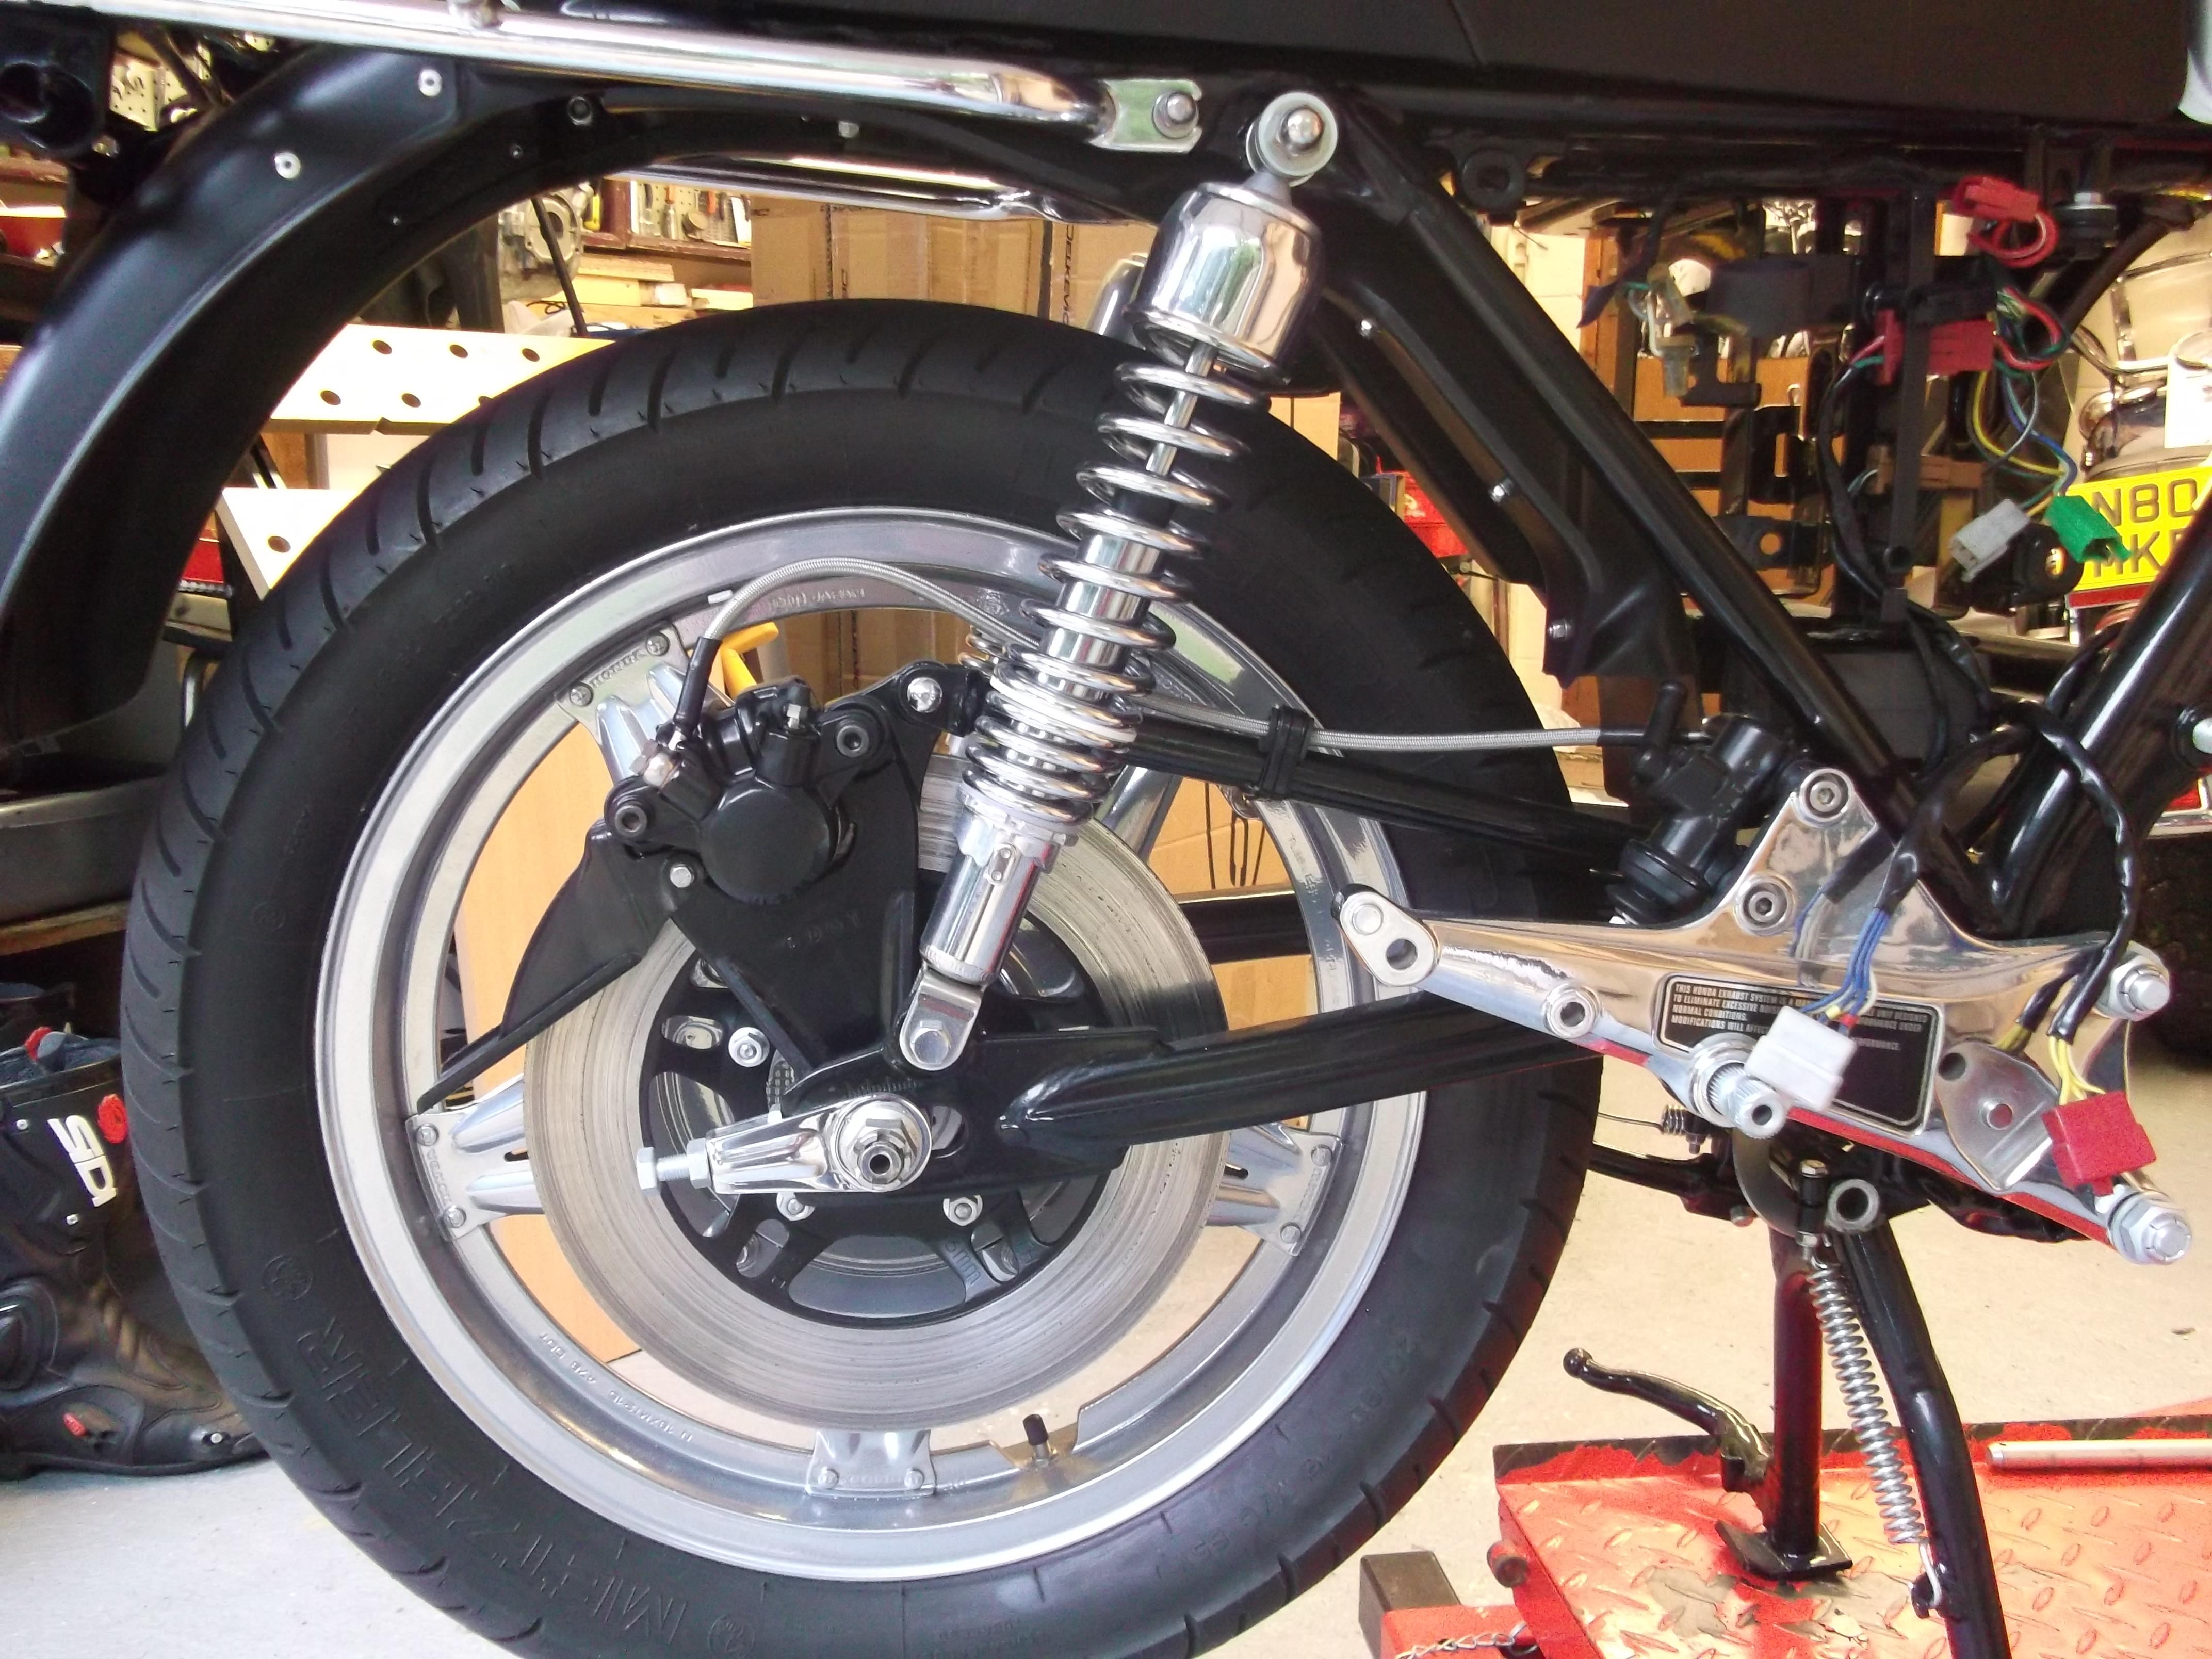 Honda CBX1000 - 1978 - Rear Brake, Chain Adjuster and Footrest Bracket.